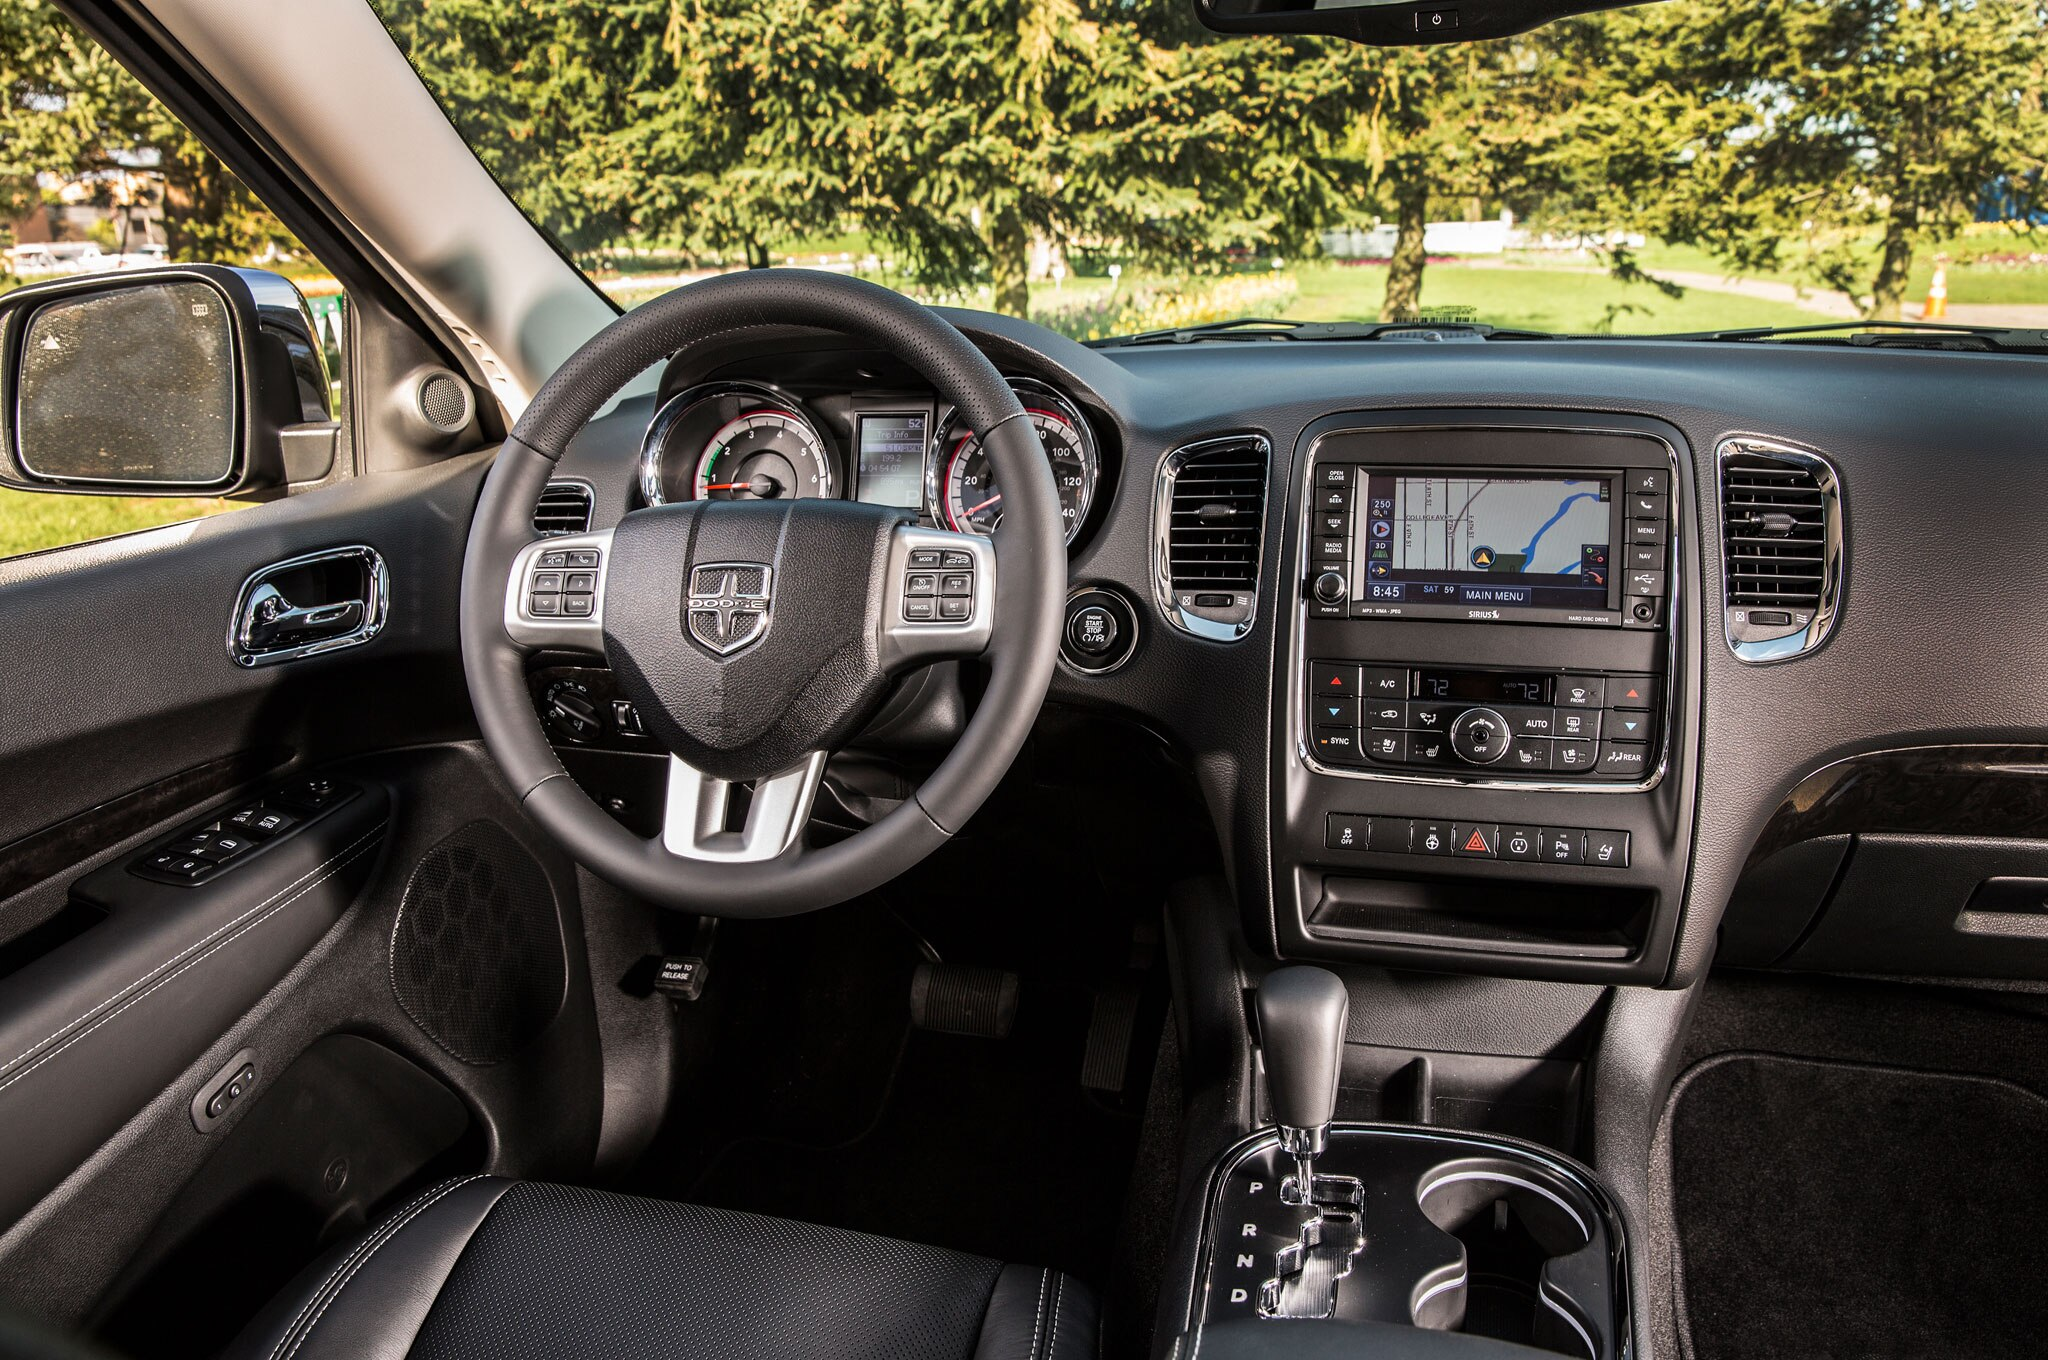 features showdown trend truck view rt vs styling dodge front durango prevnext